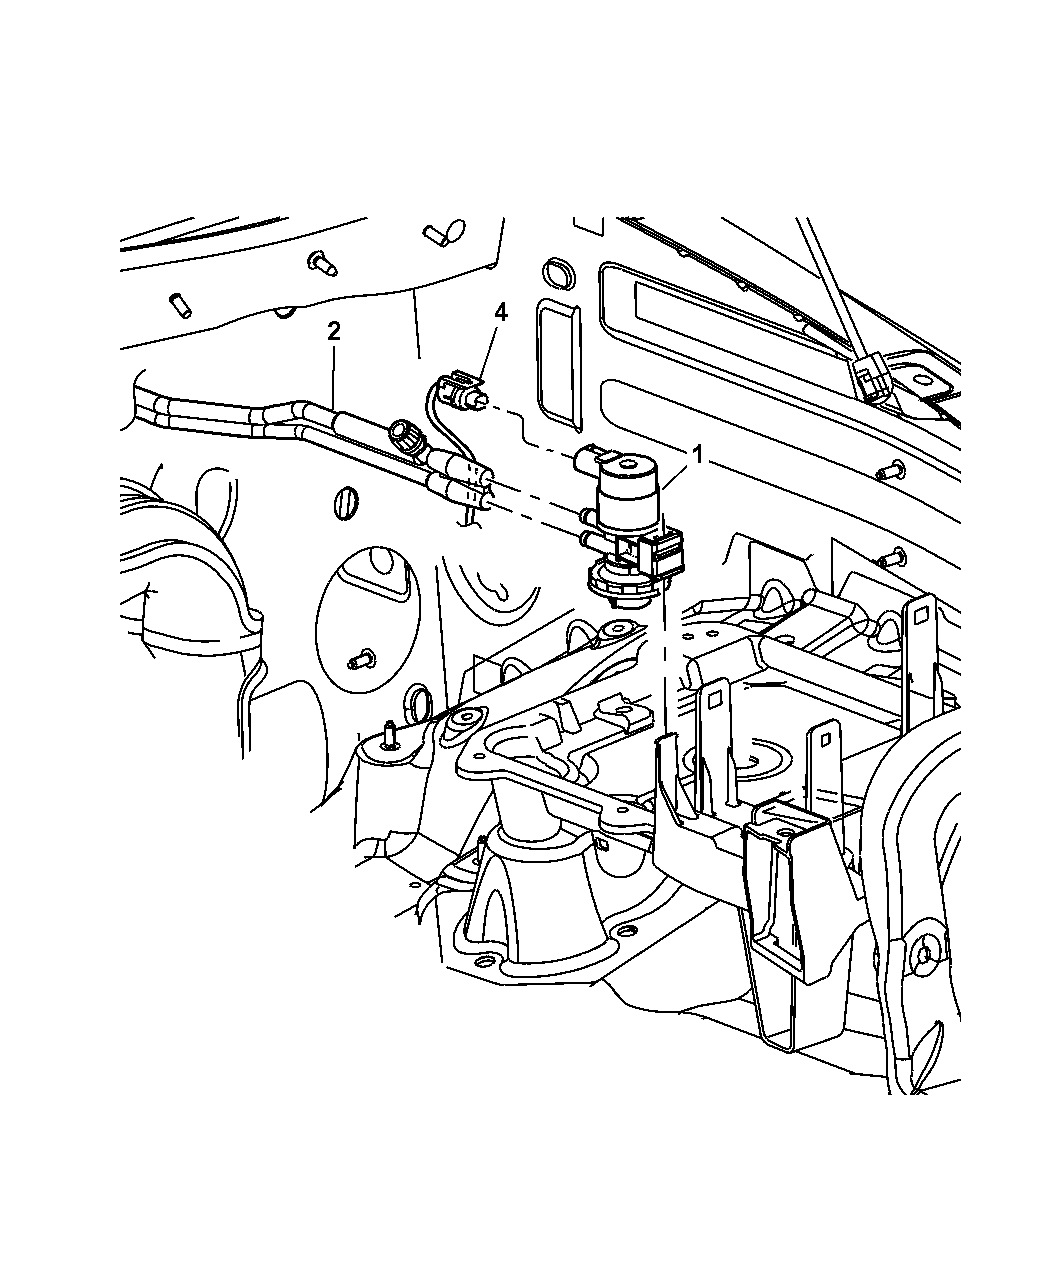 53013363ac Genuine Jeep Tube Vacuum Liberty Engine Part Diagram 2003 Emission Harness